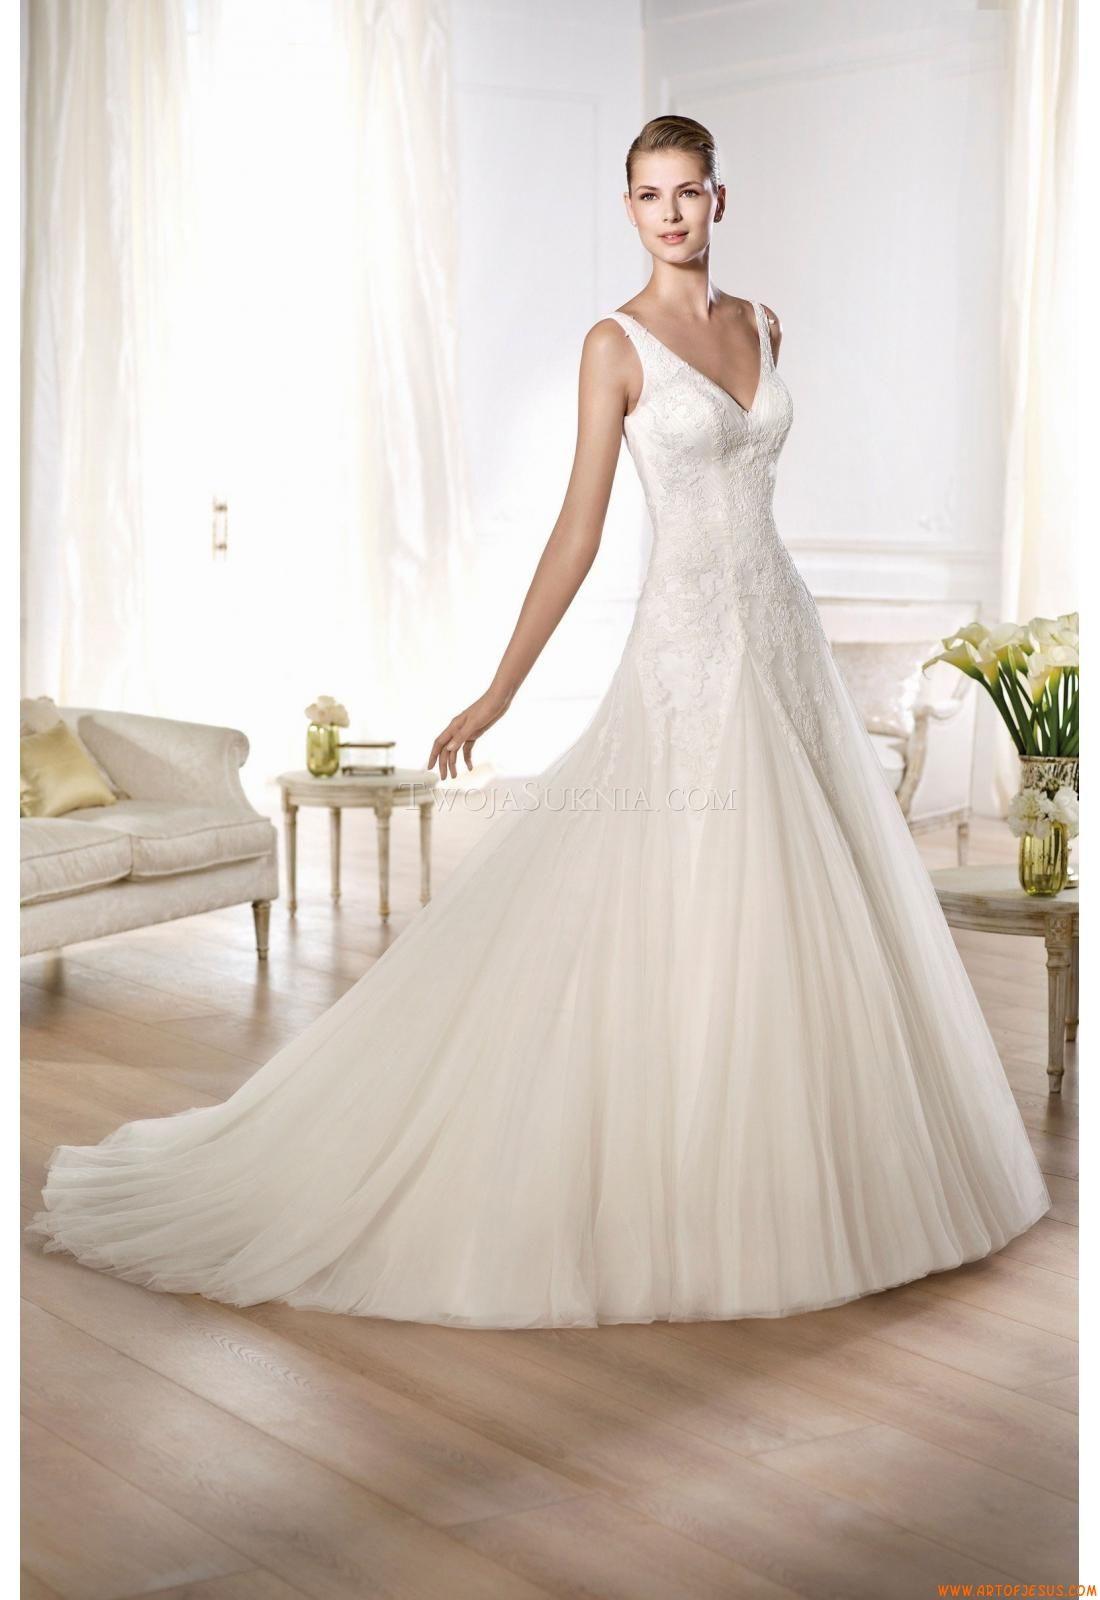 Natural wedding dresses  Wedding Dresses Pronovias Oly   DressLacy  Pinterest